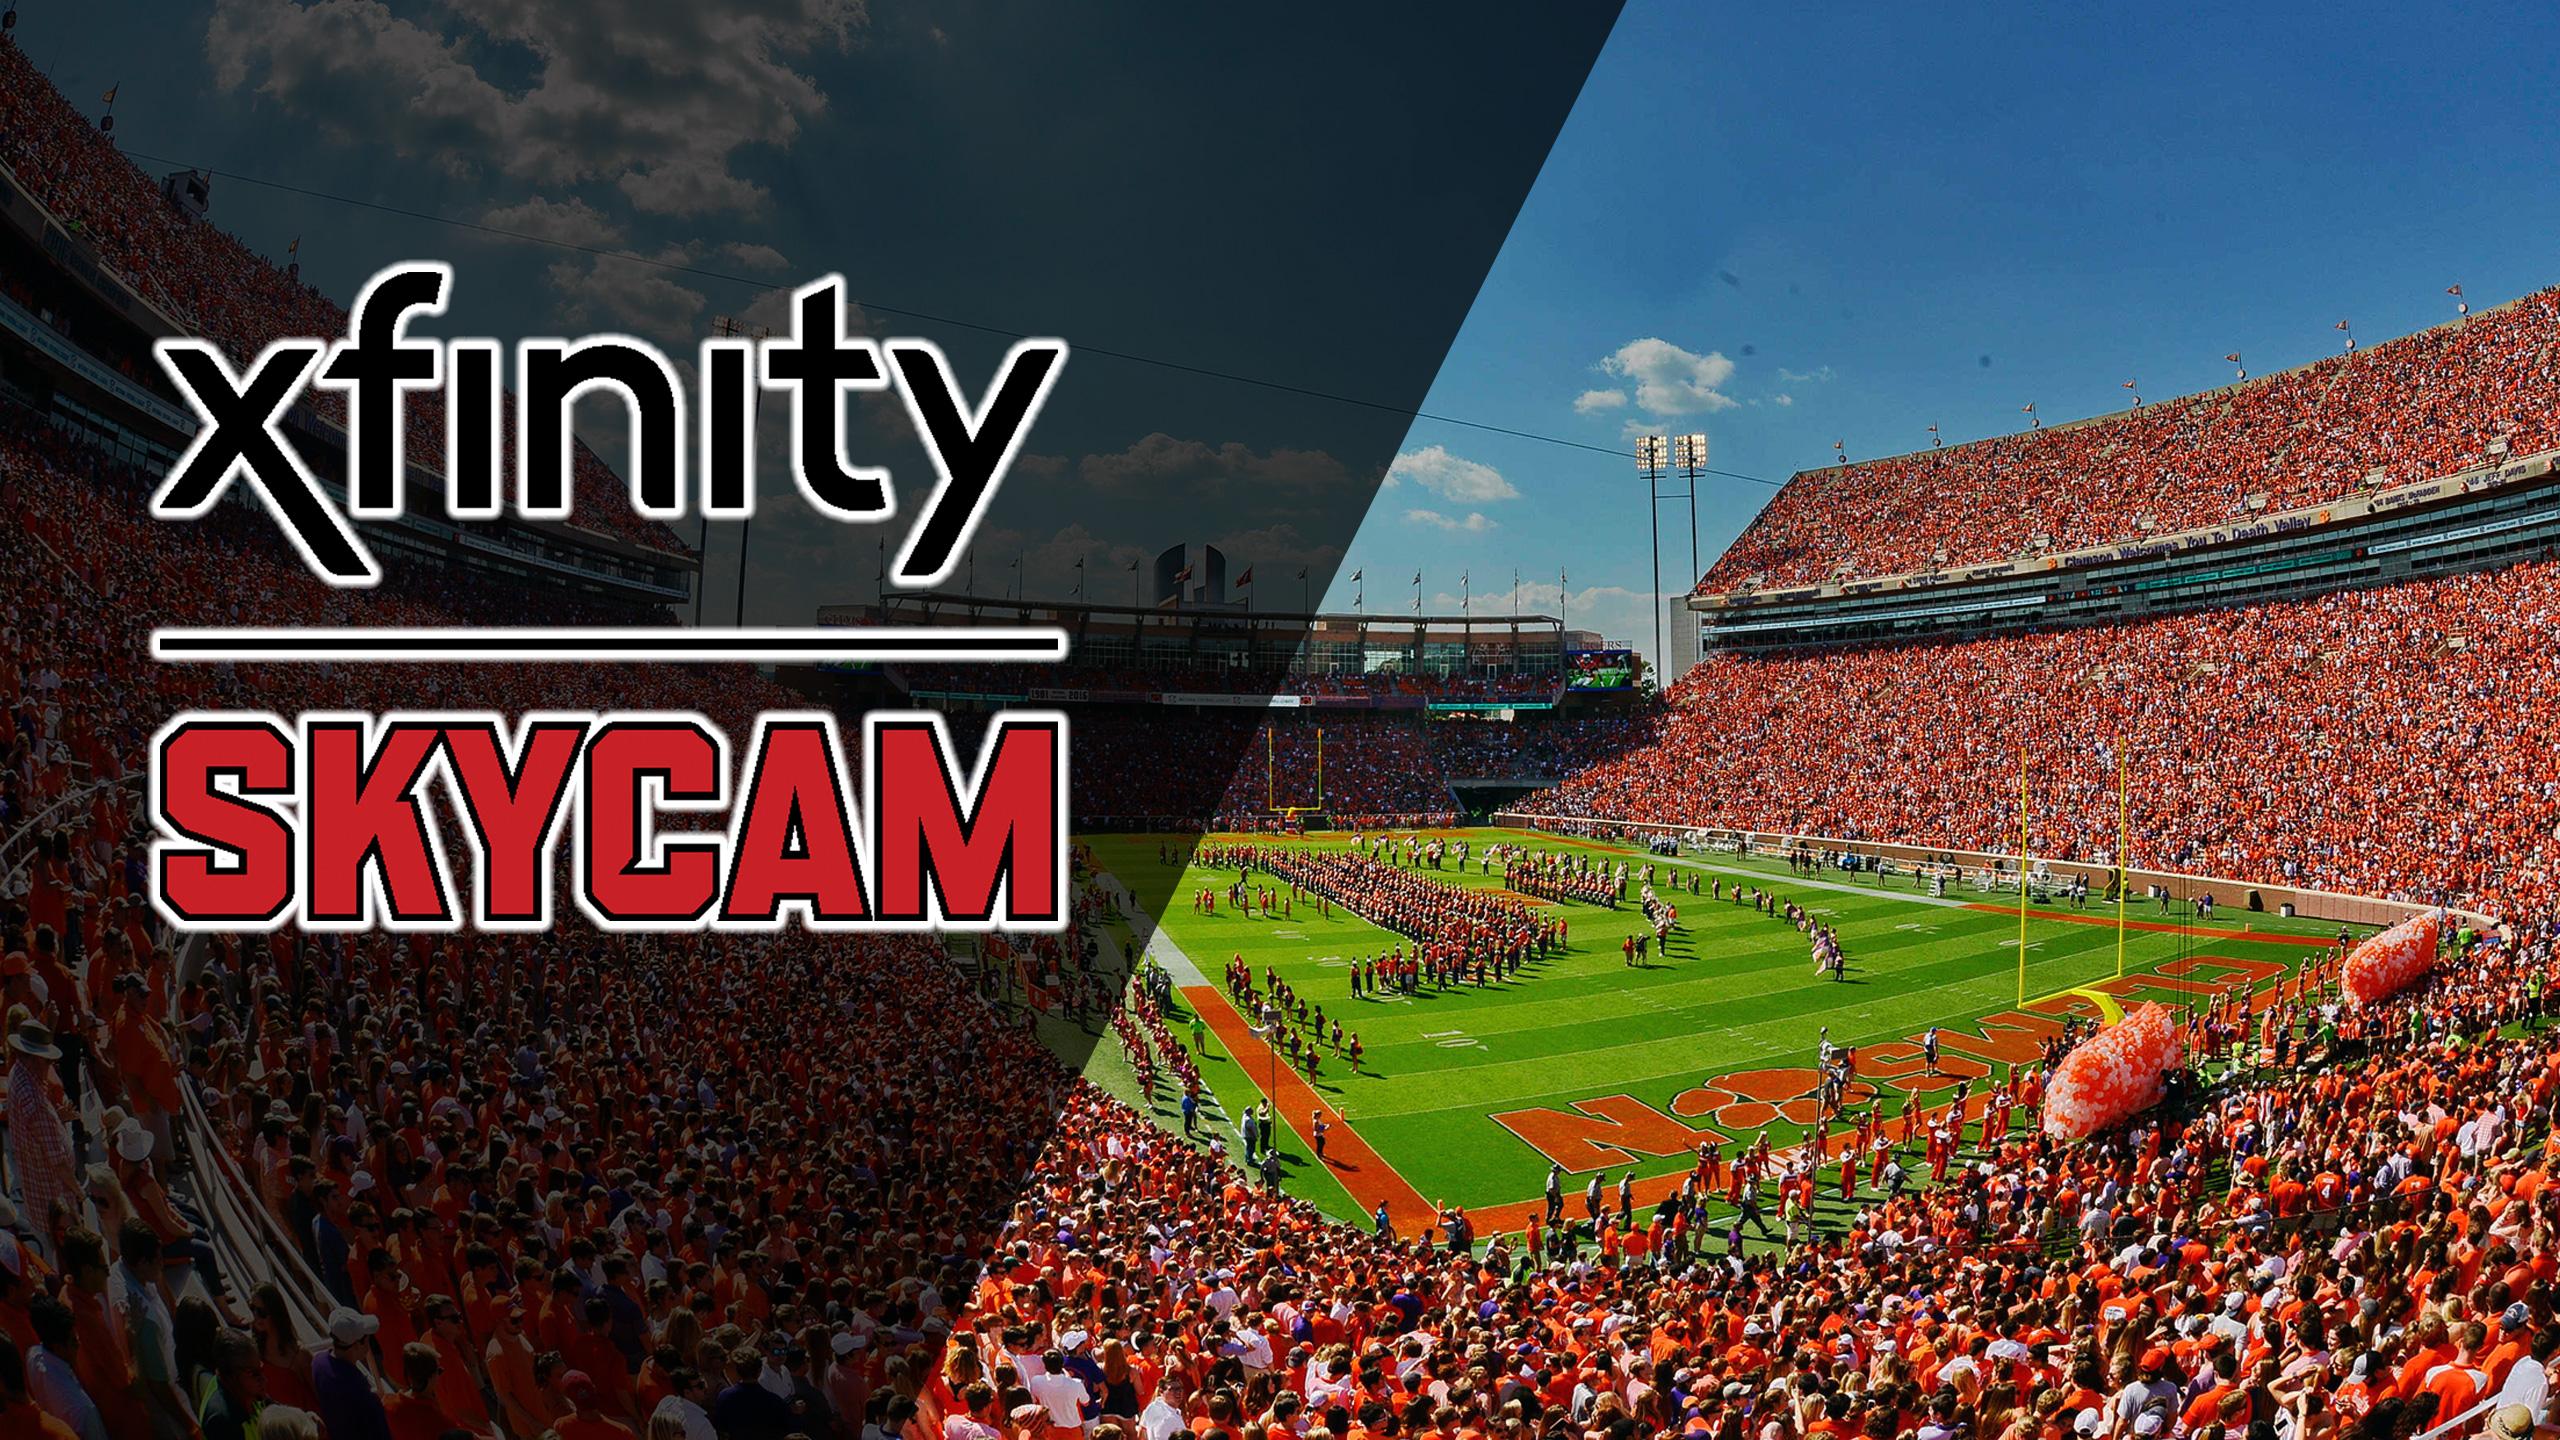 Xfinity Skycam - Duke vs. #2 Clemson (Football)